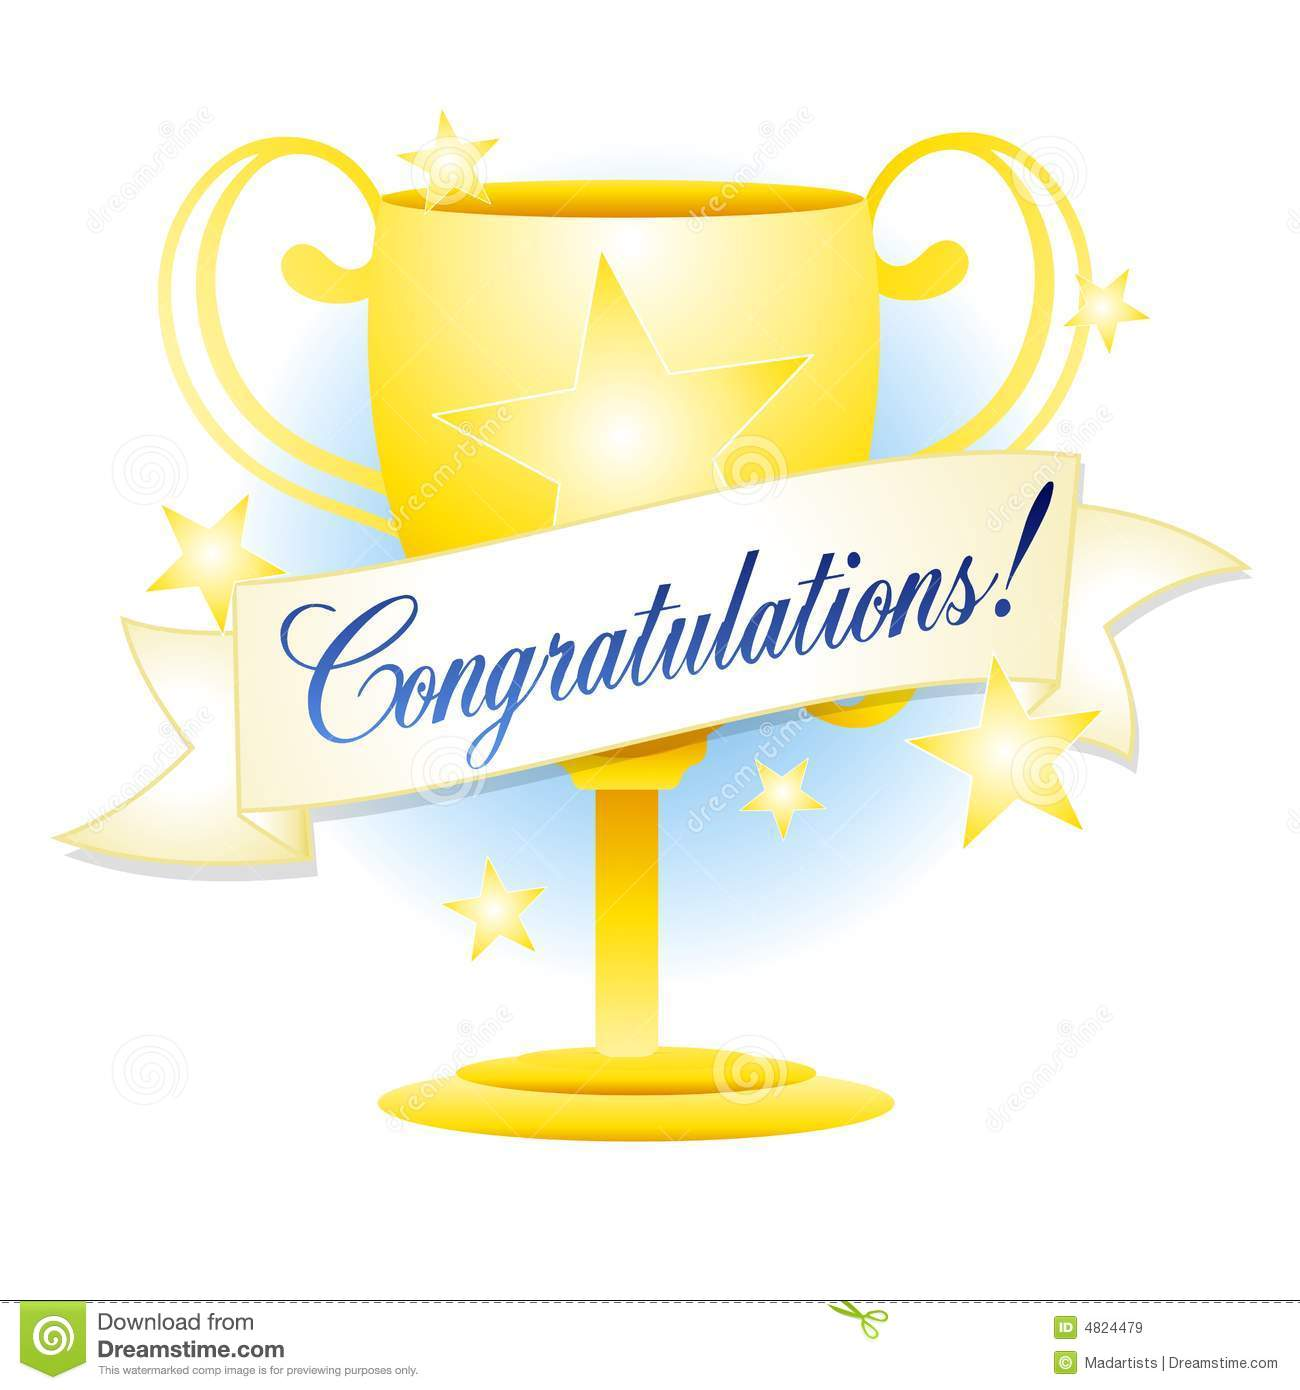 Congratulations Clipart Free Download.